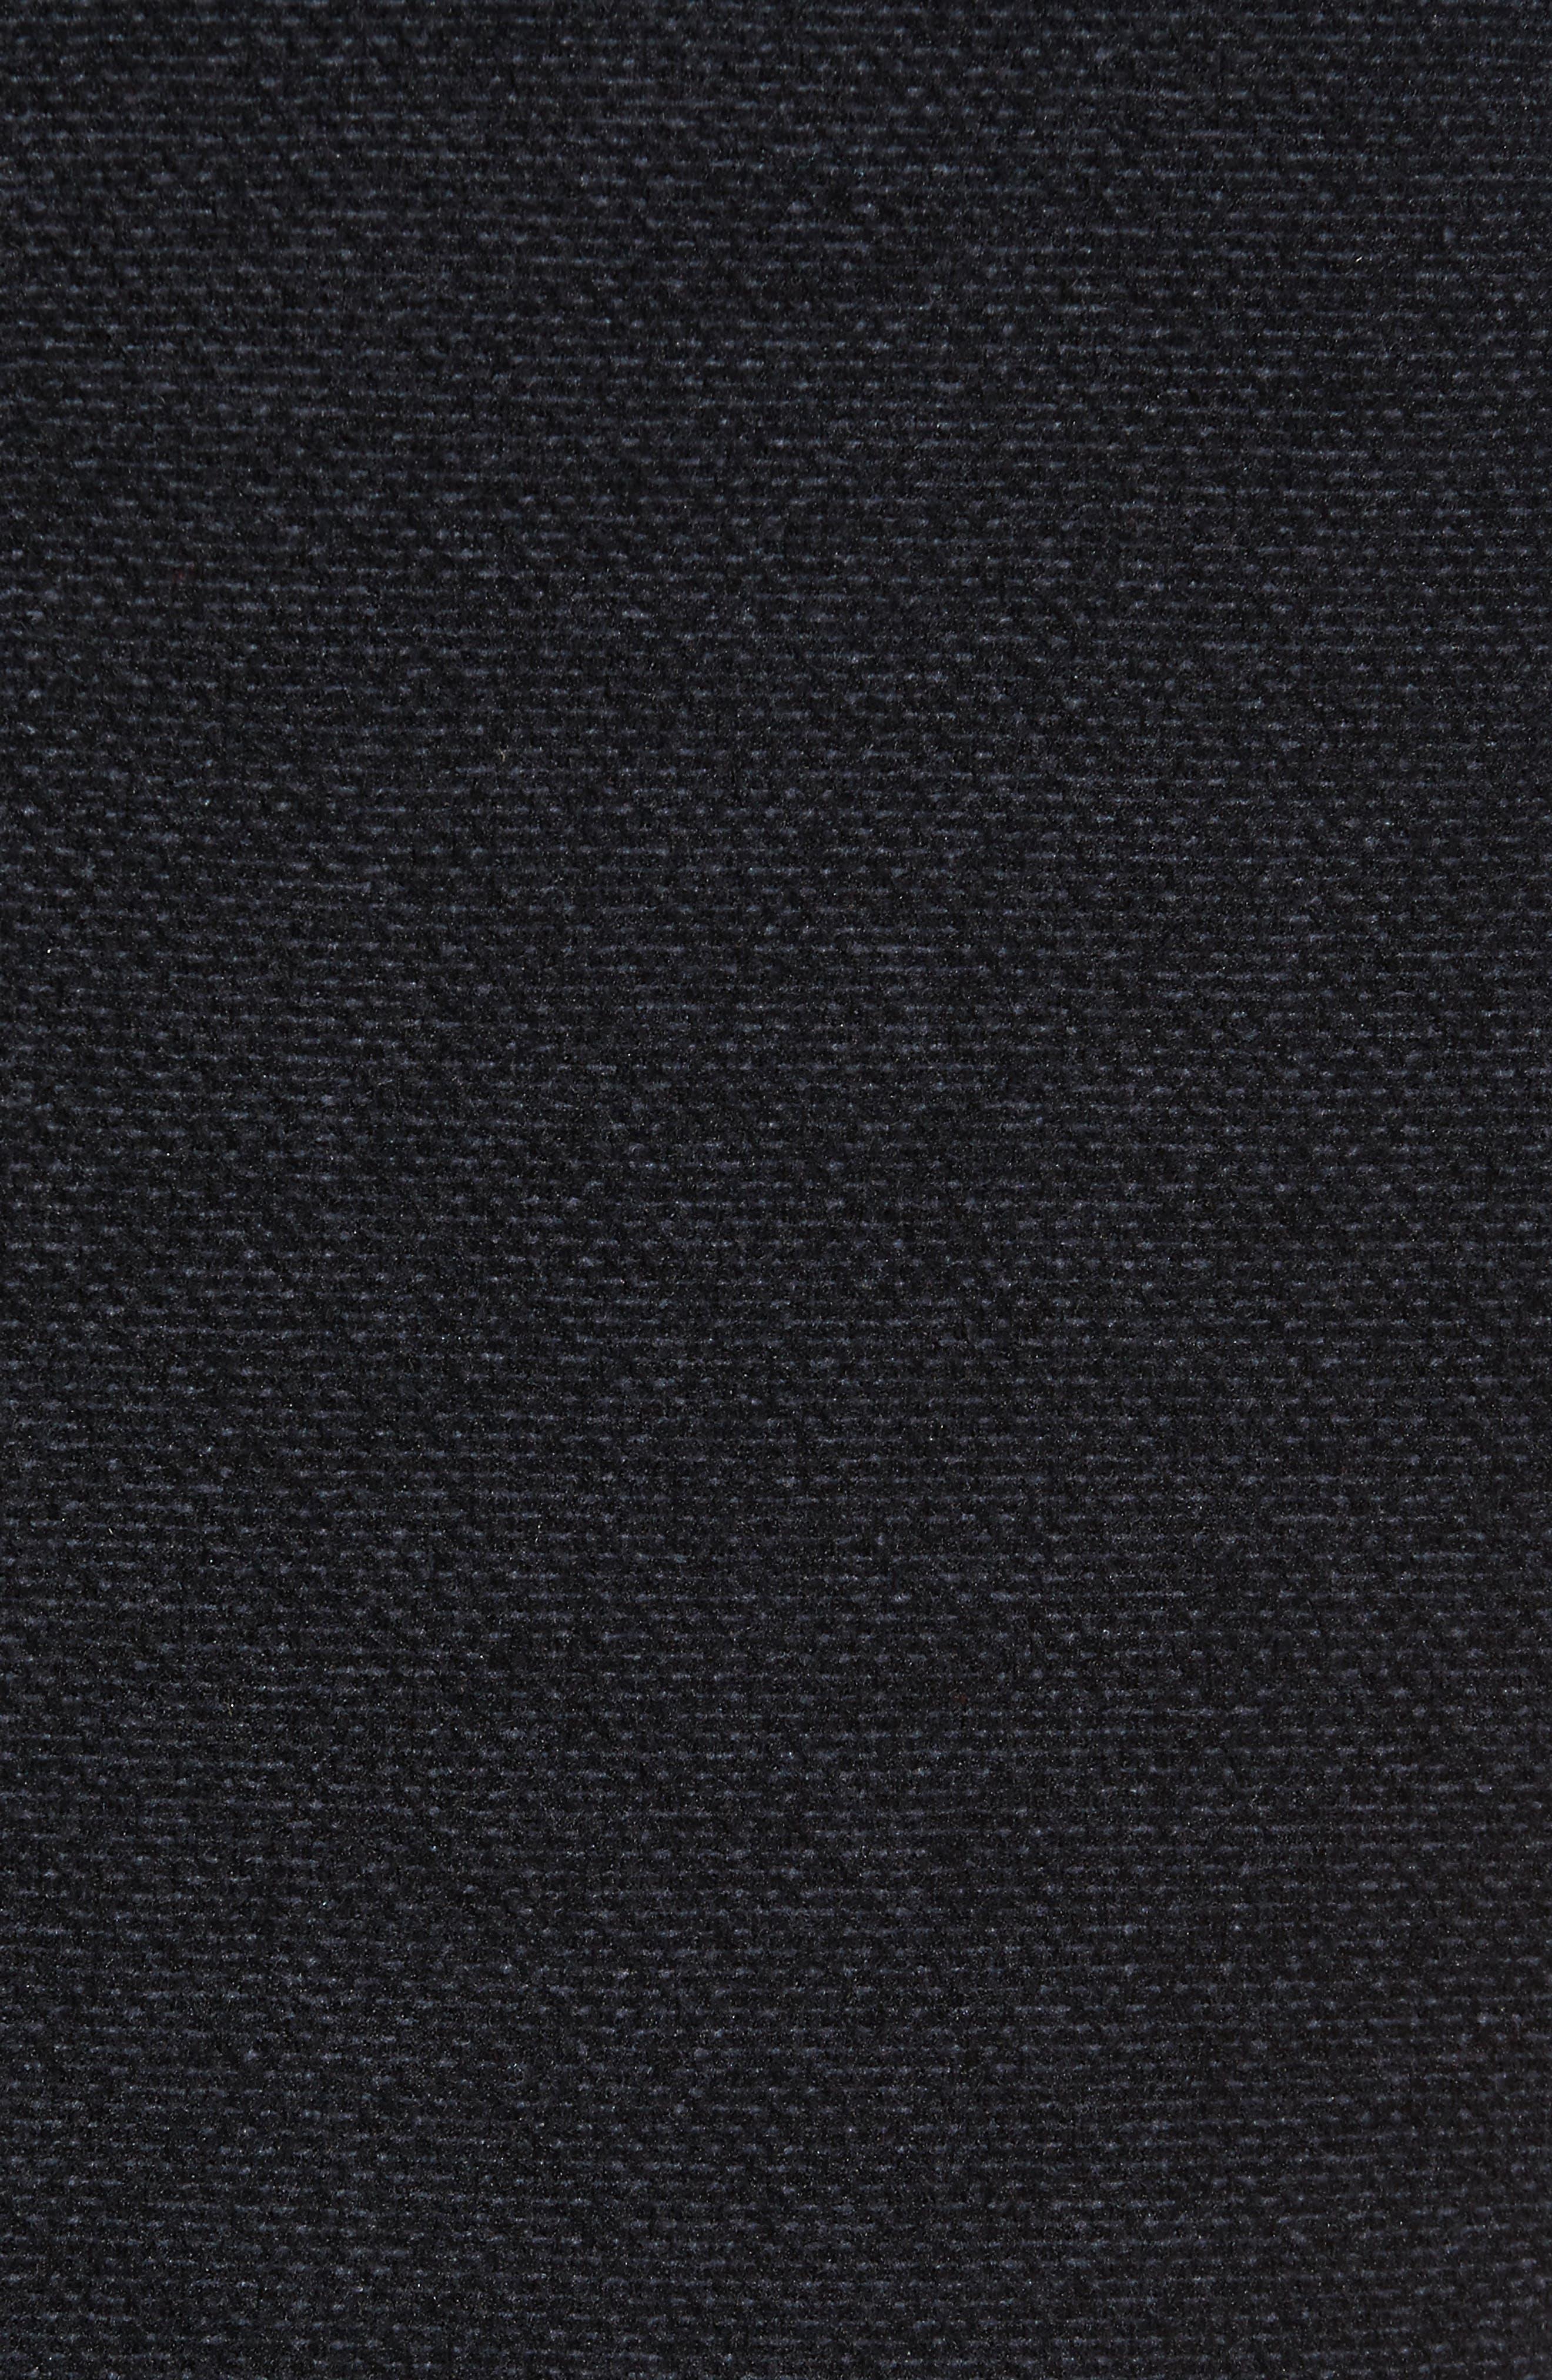 Quilted Yoke Fleece Vest,                             Alternate thumbnail 6, color,